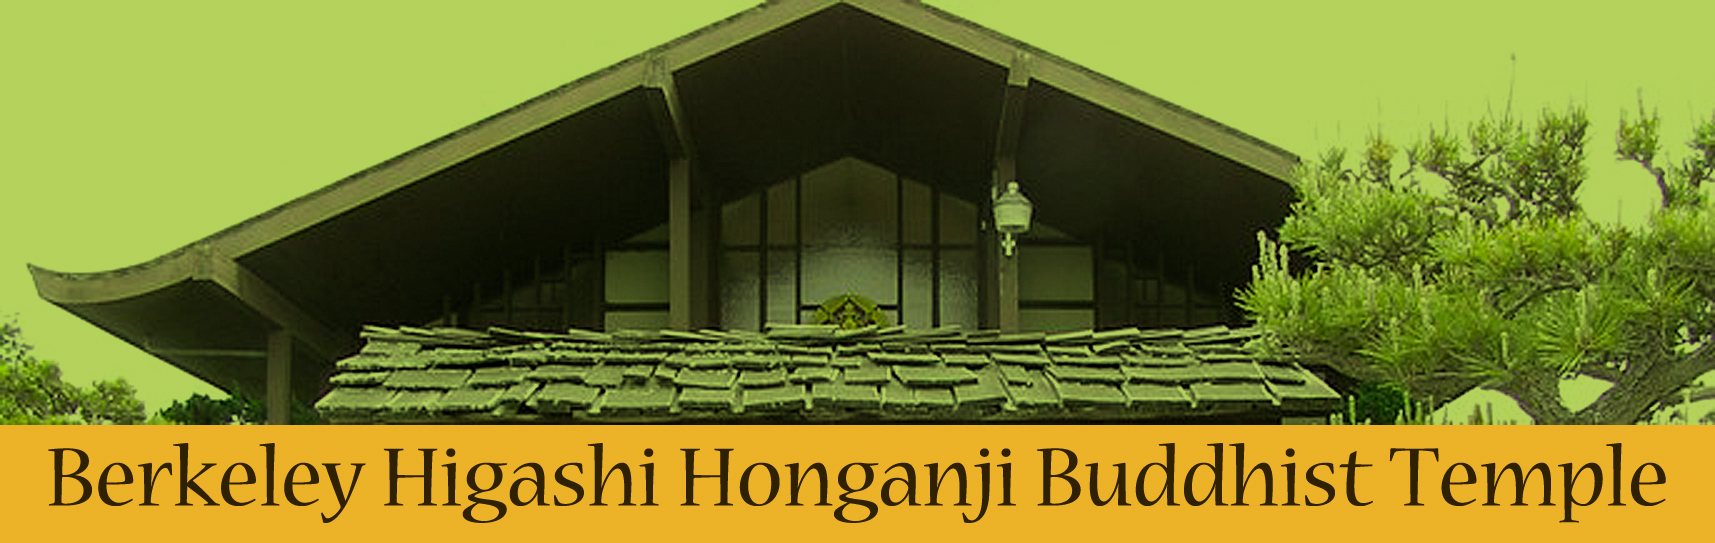 Berkeley Higashi Honganji